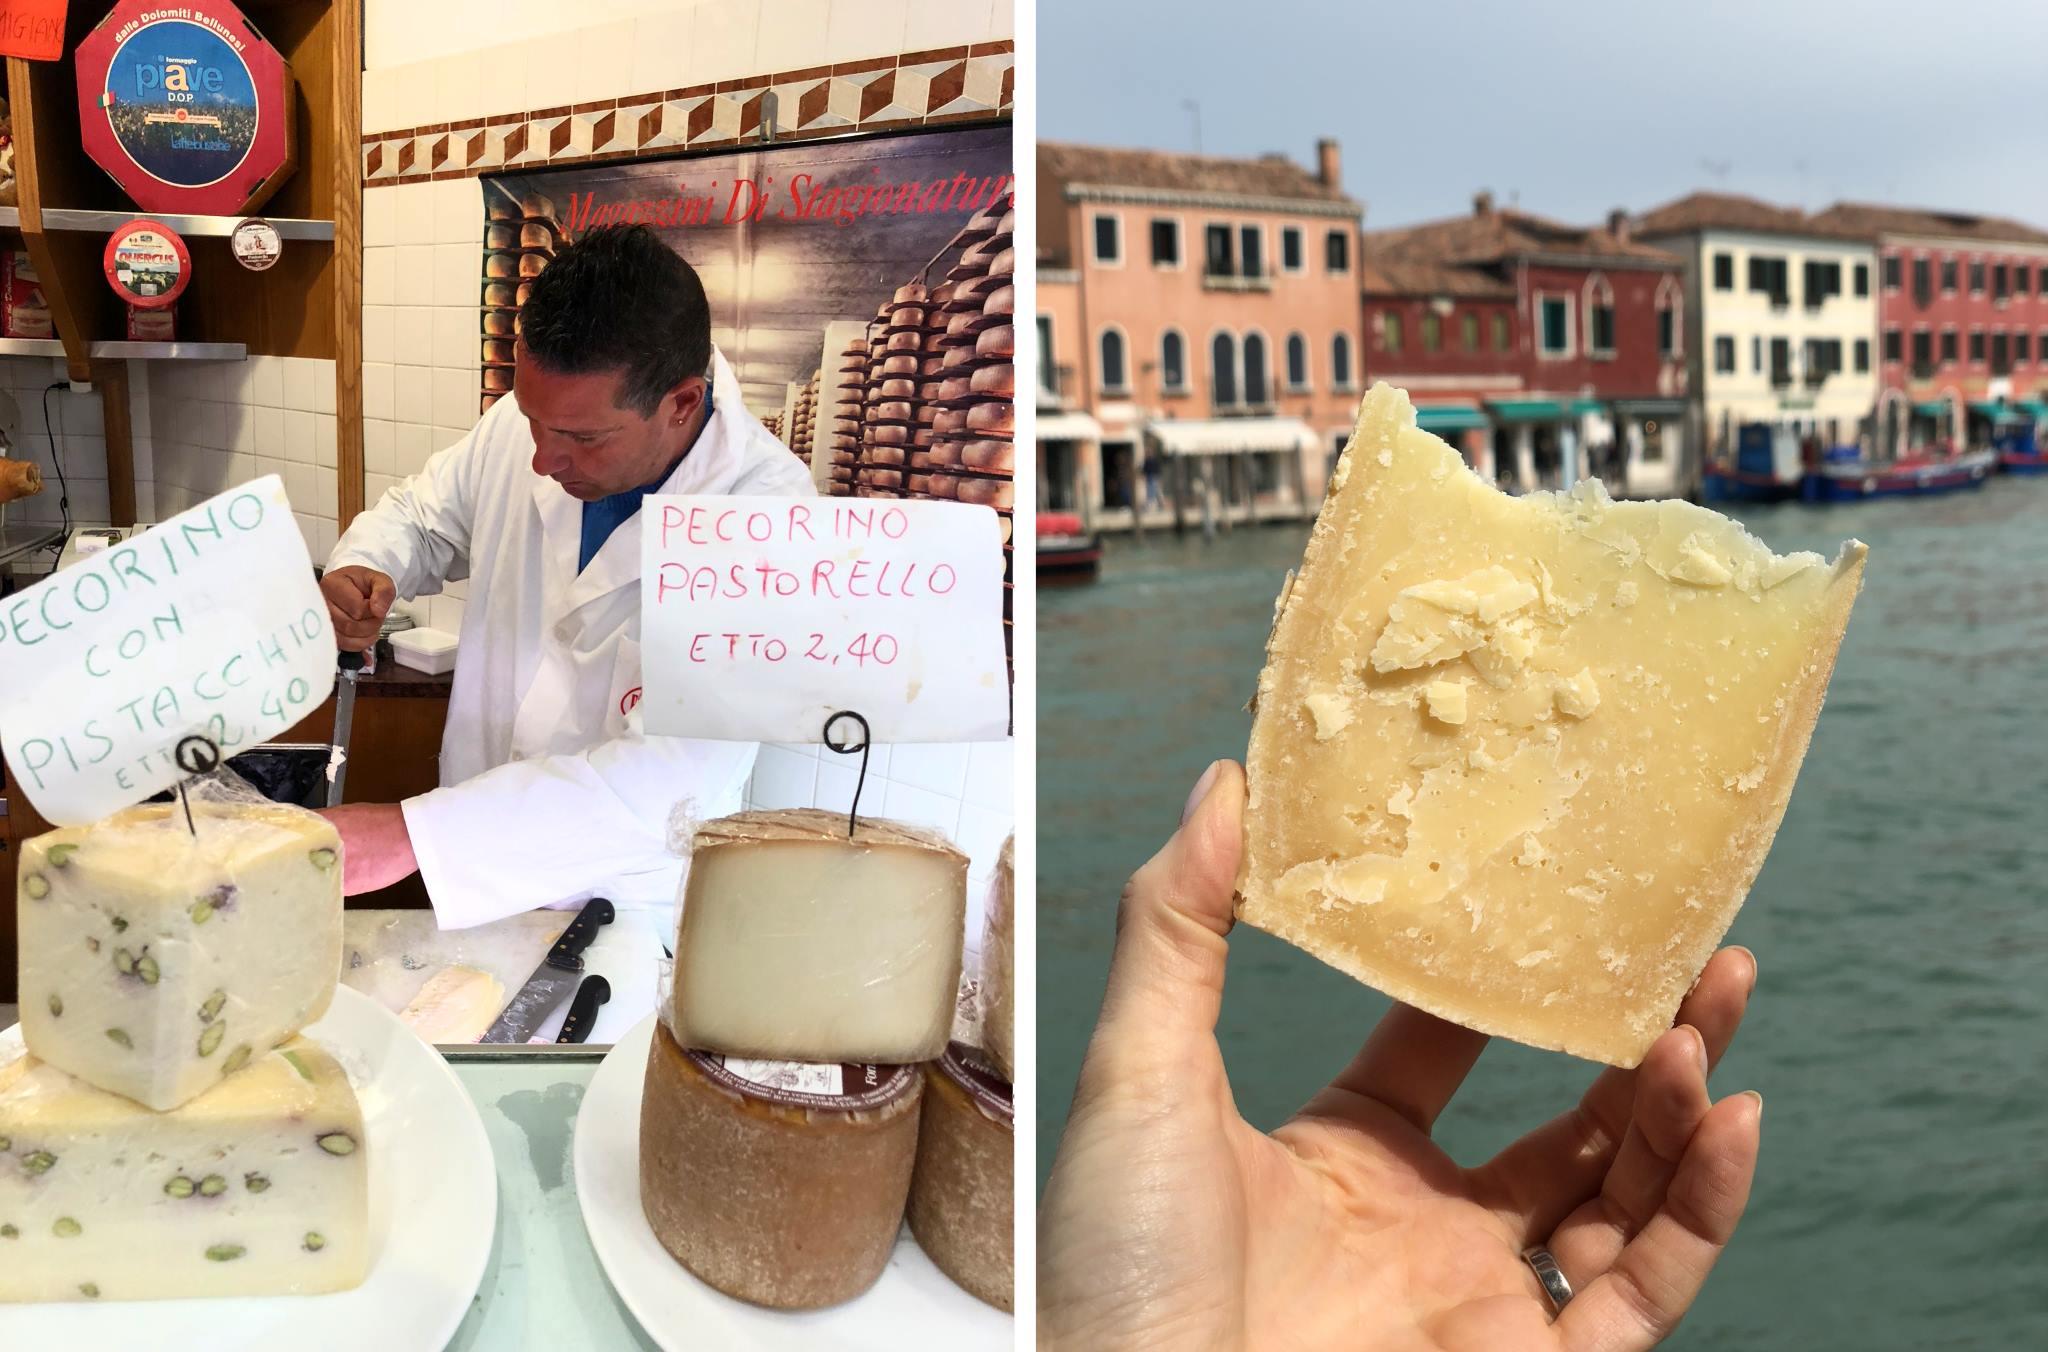 Latteria Ronchi Francesco Venise Italy Gluten free